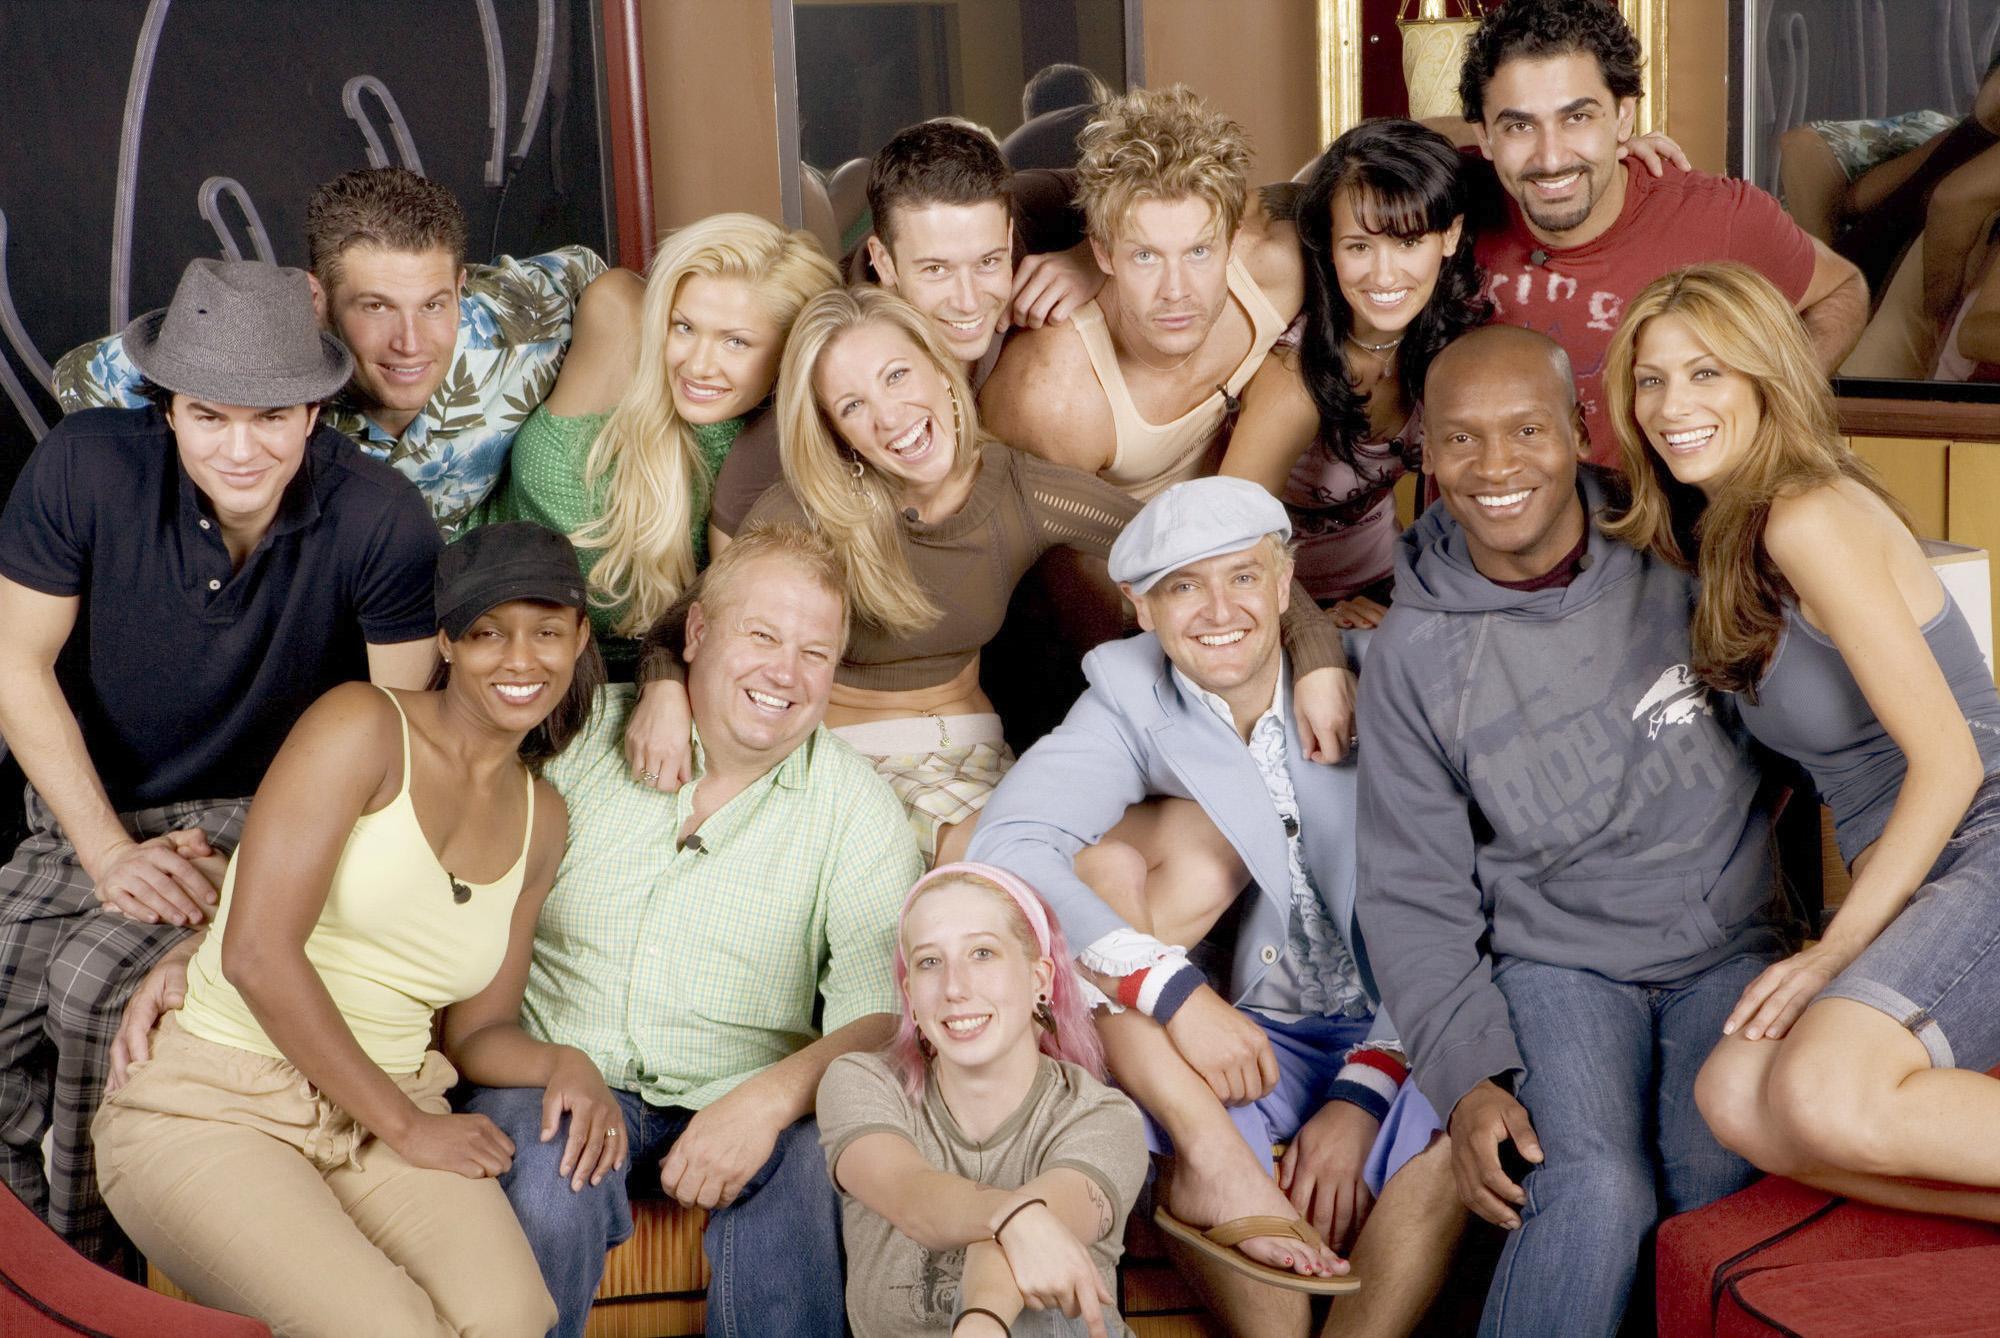 File:Big Brother All Stars Cast.jpg